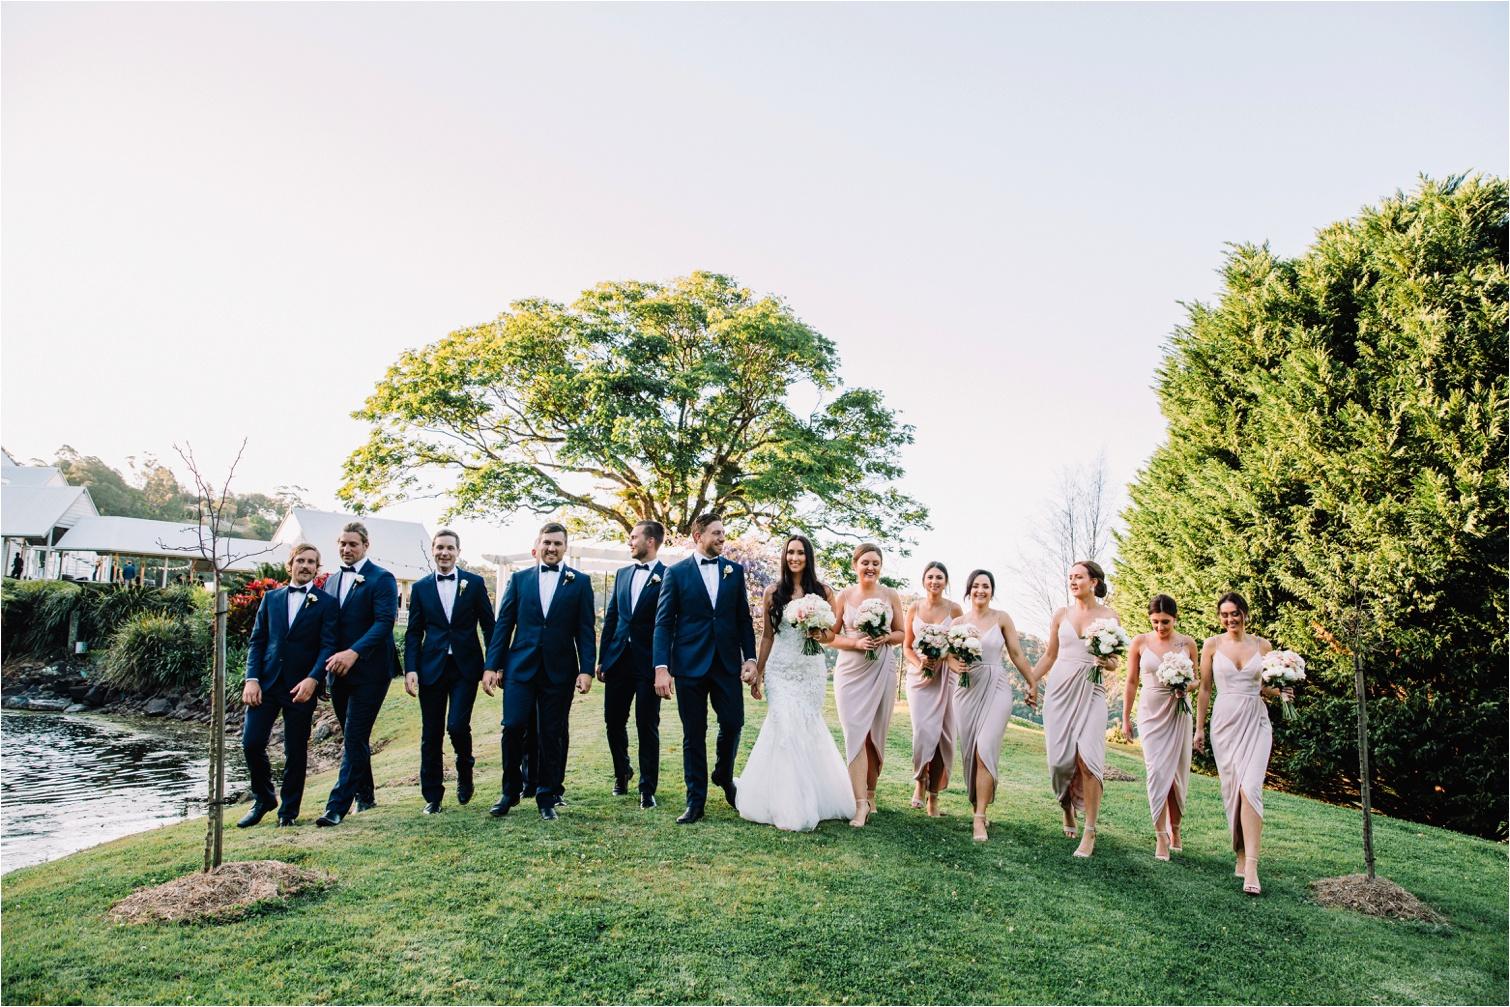 Maleny Manor Wedding Photography - Gold Coast Wedding Photographer_0035.jpg